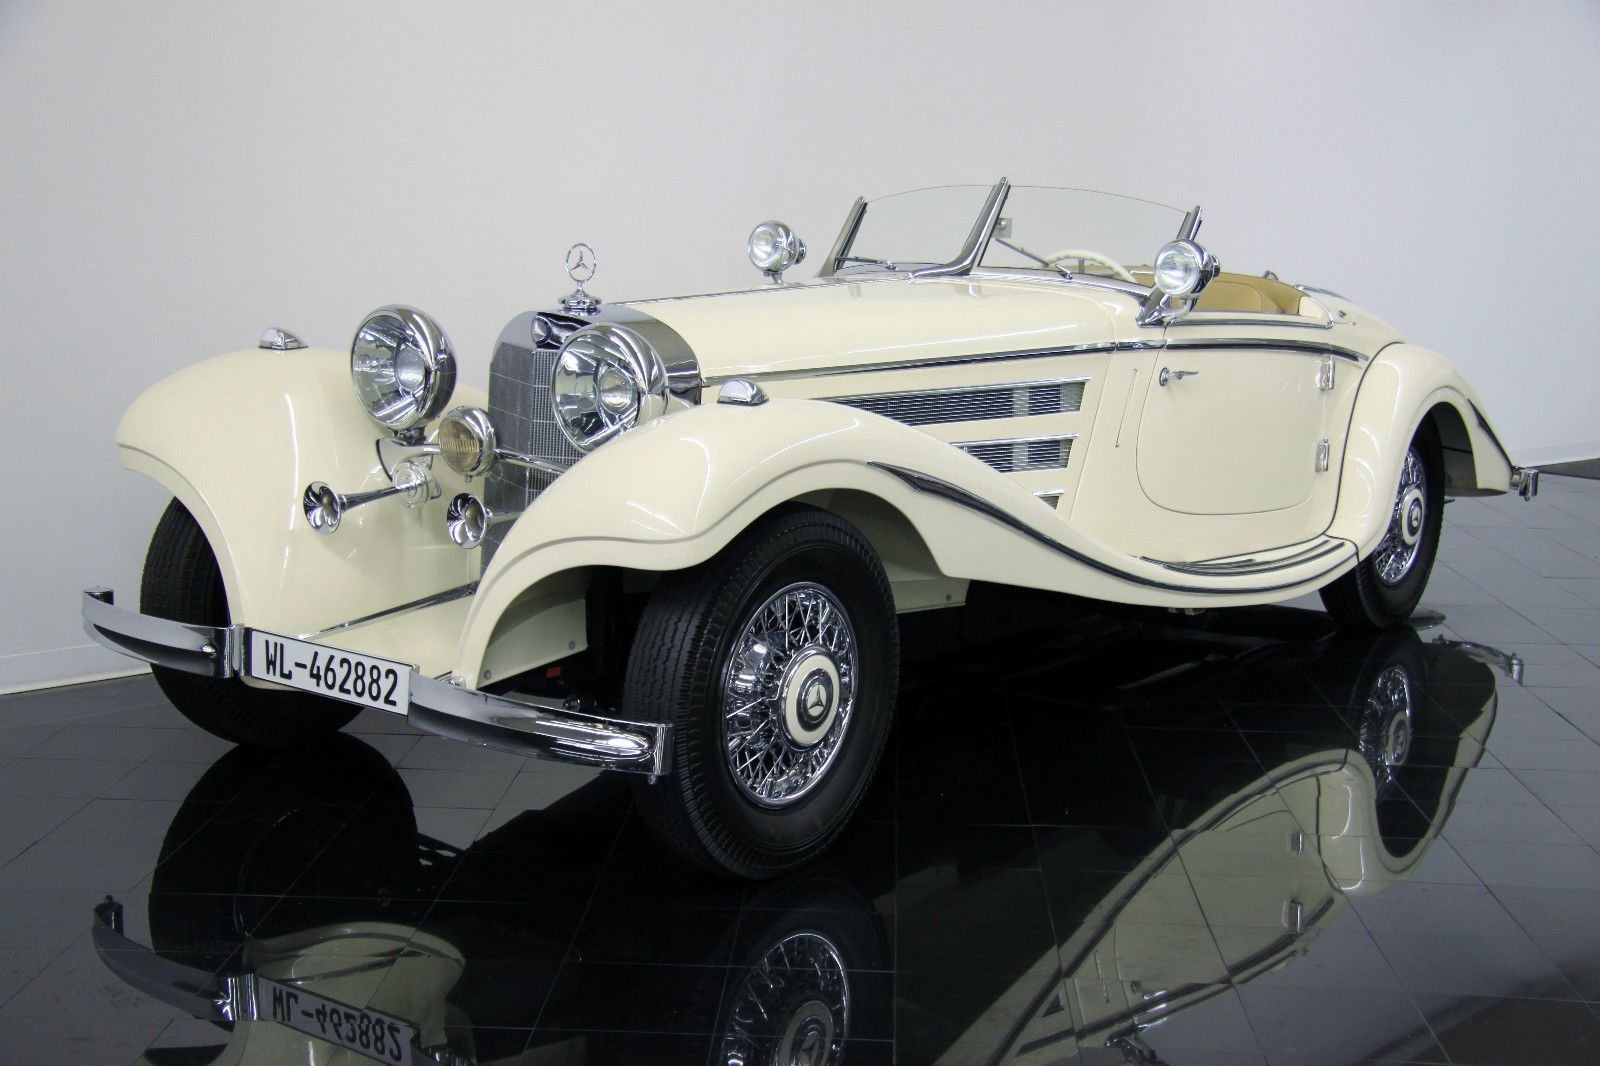 US $1,585,500.00 Used in eBay Motors, Cars & Trucks, Mercedes-Benz ...